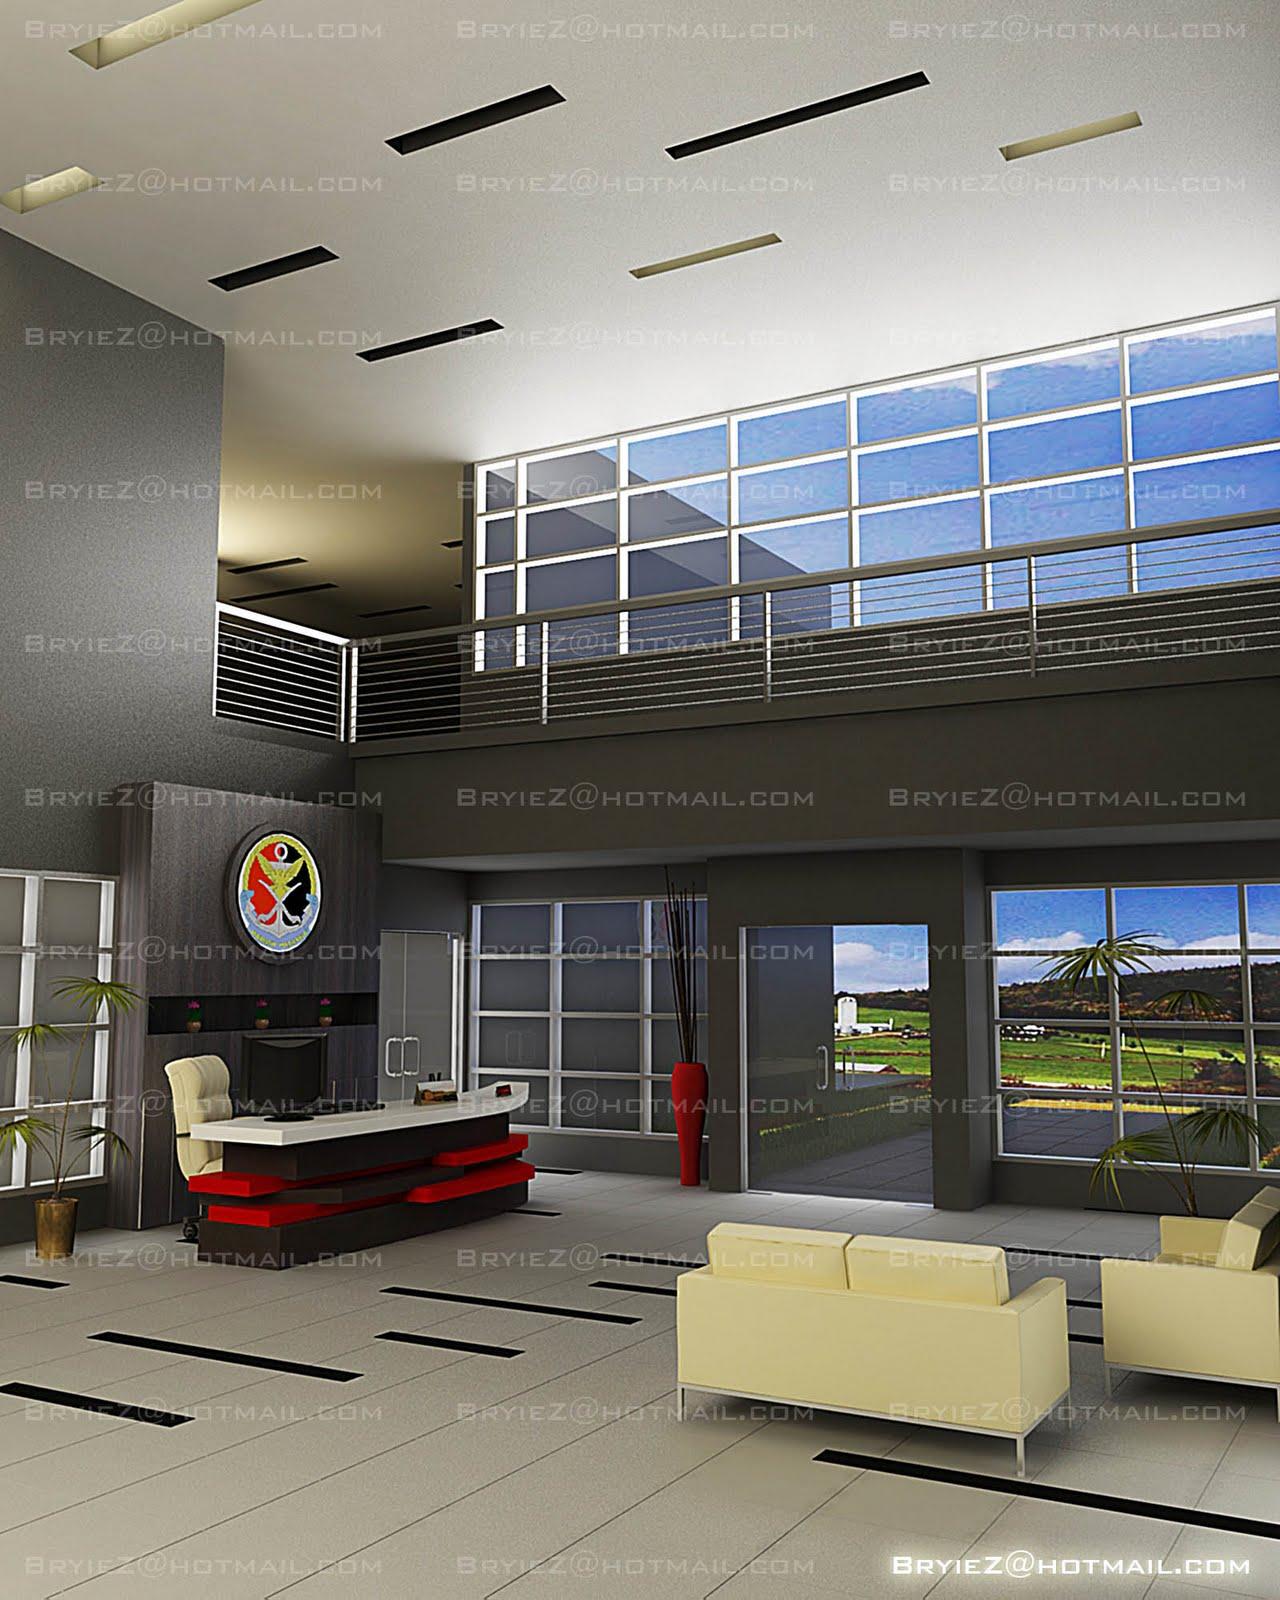 Lobby Interior Design: BryieZ Interior Space + Design